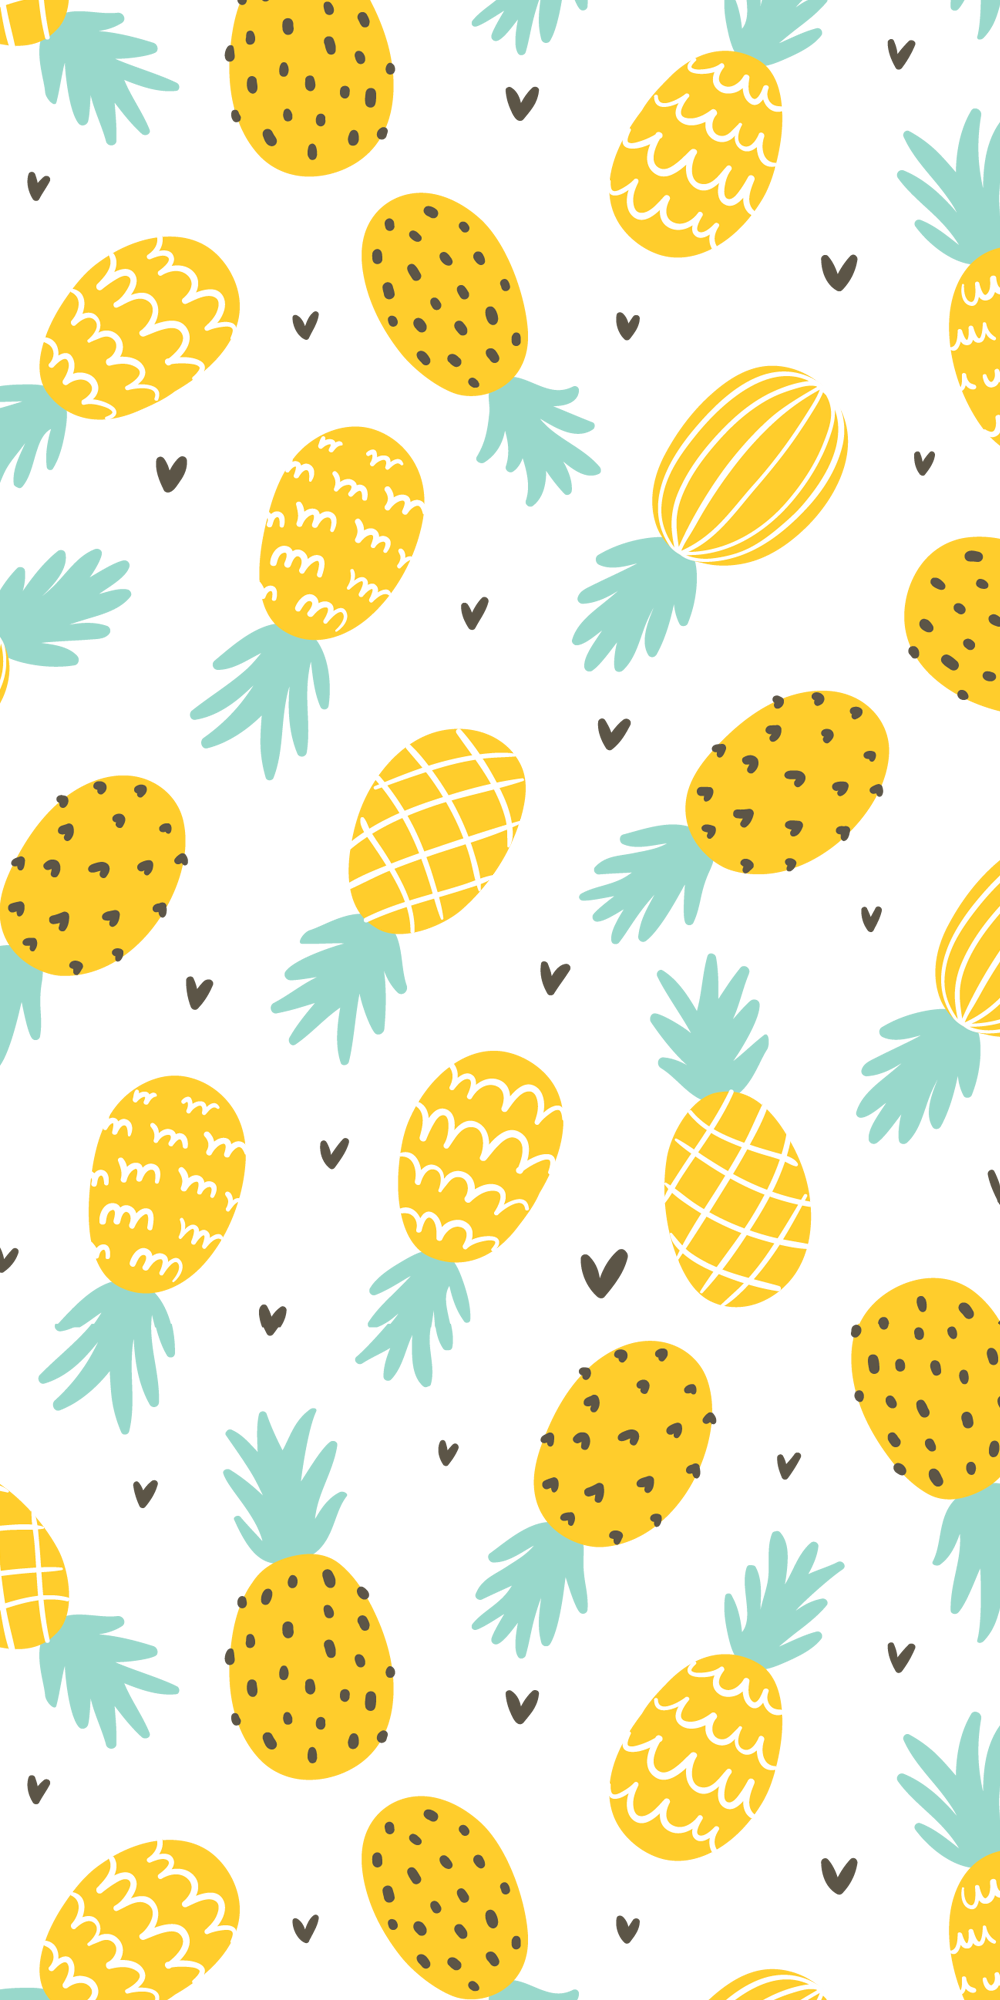 Fruit Pattern Iphone Wallpapers Top Free Fruit Pattern Iphone Backgrounds Wallpaperaccess